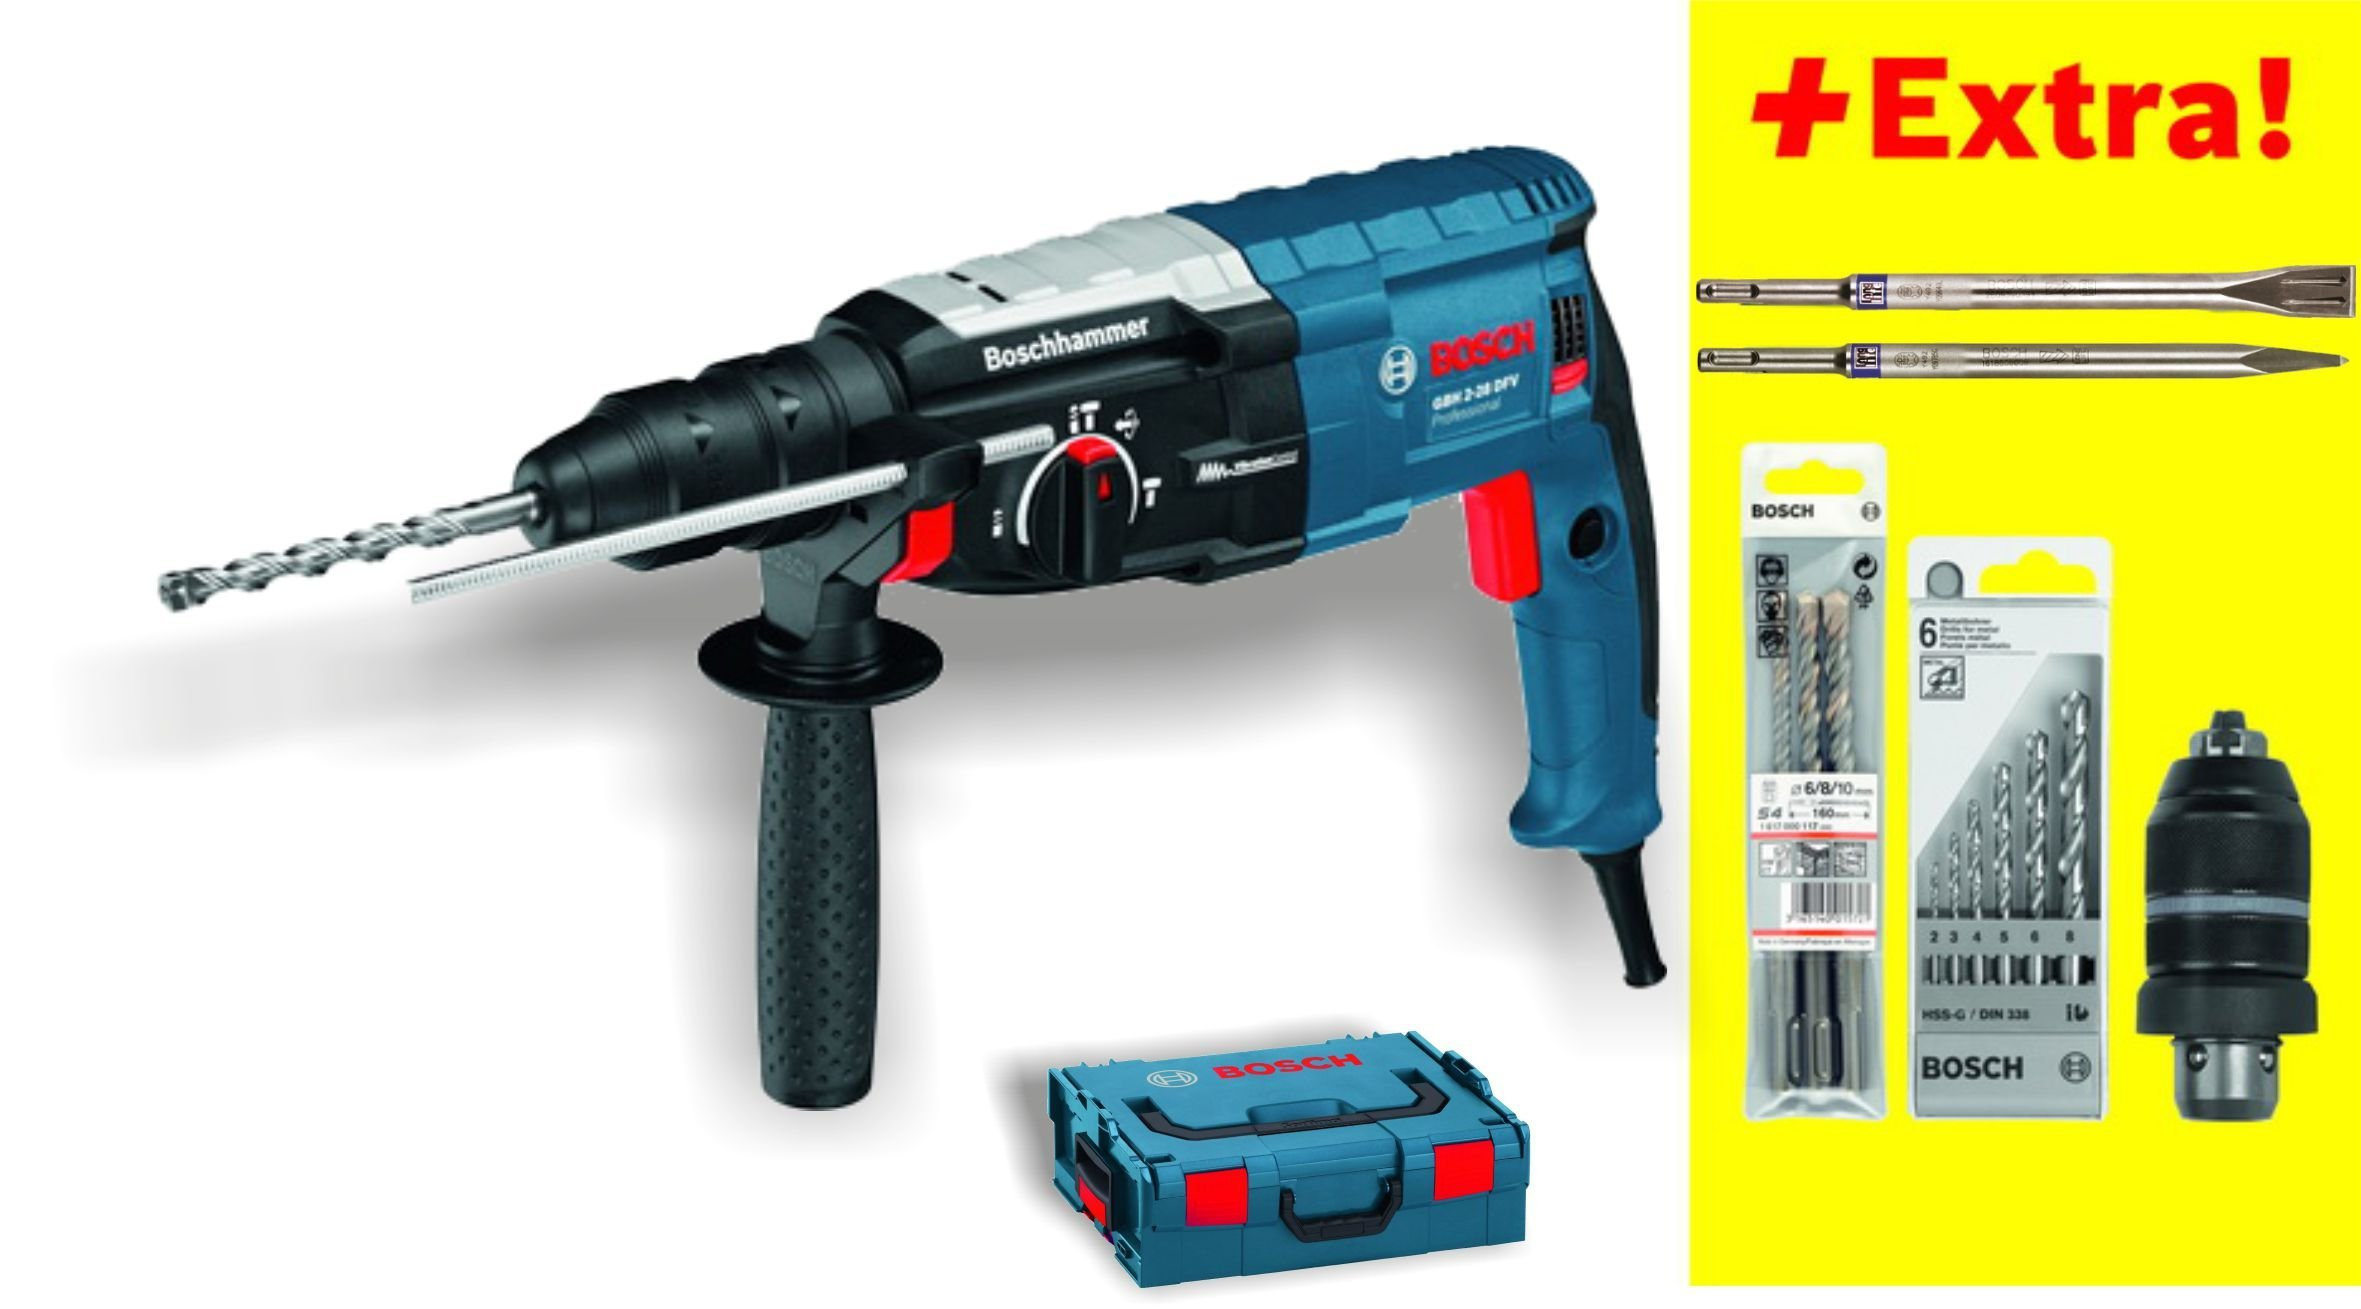 BOSCH-Bohrhammer-GBH-2-28-DFV-BSS-611267202